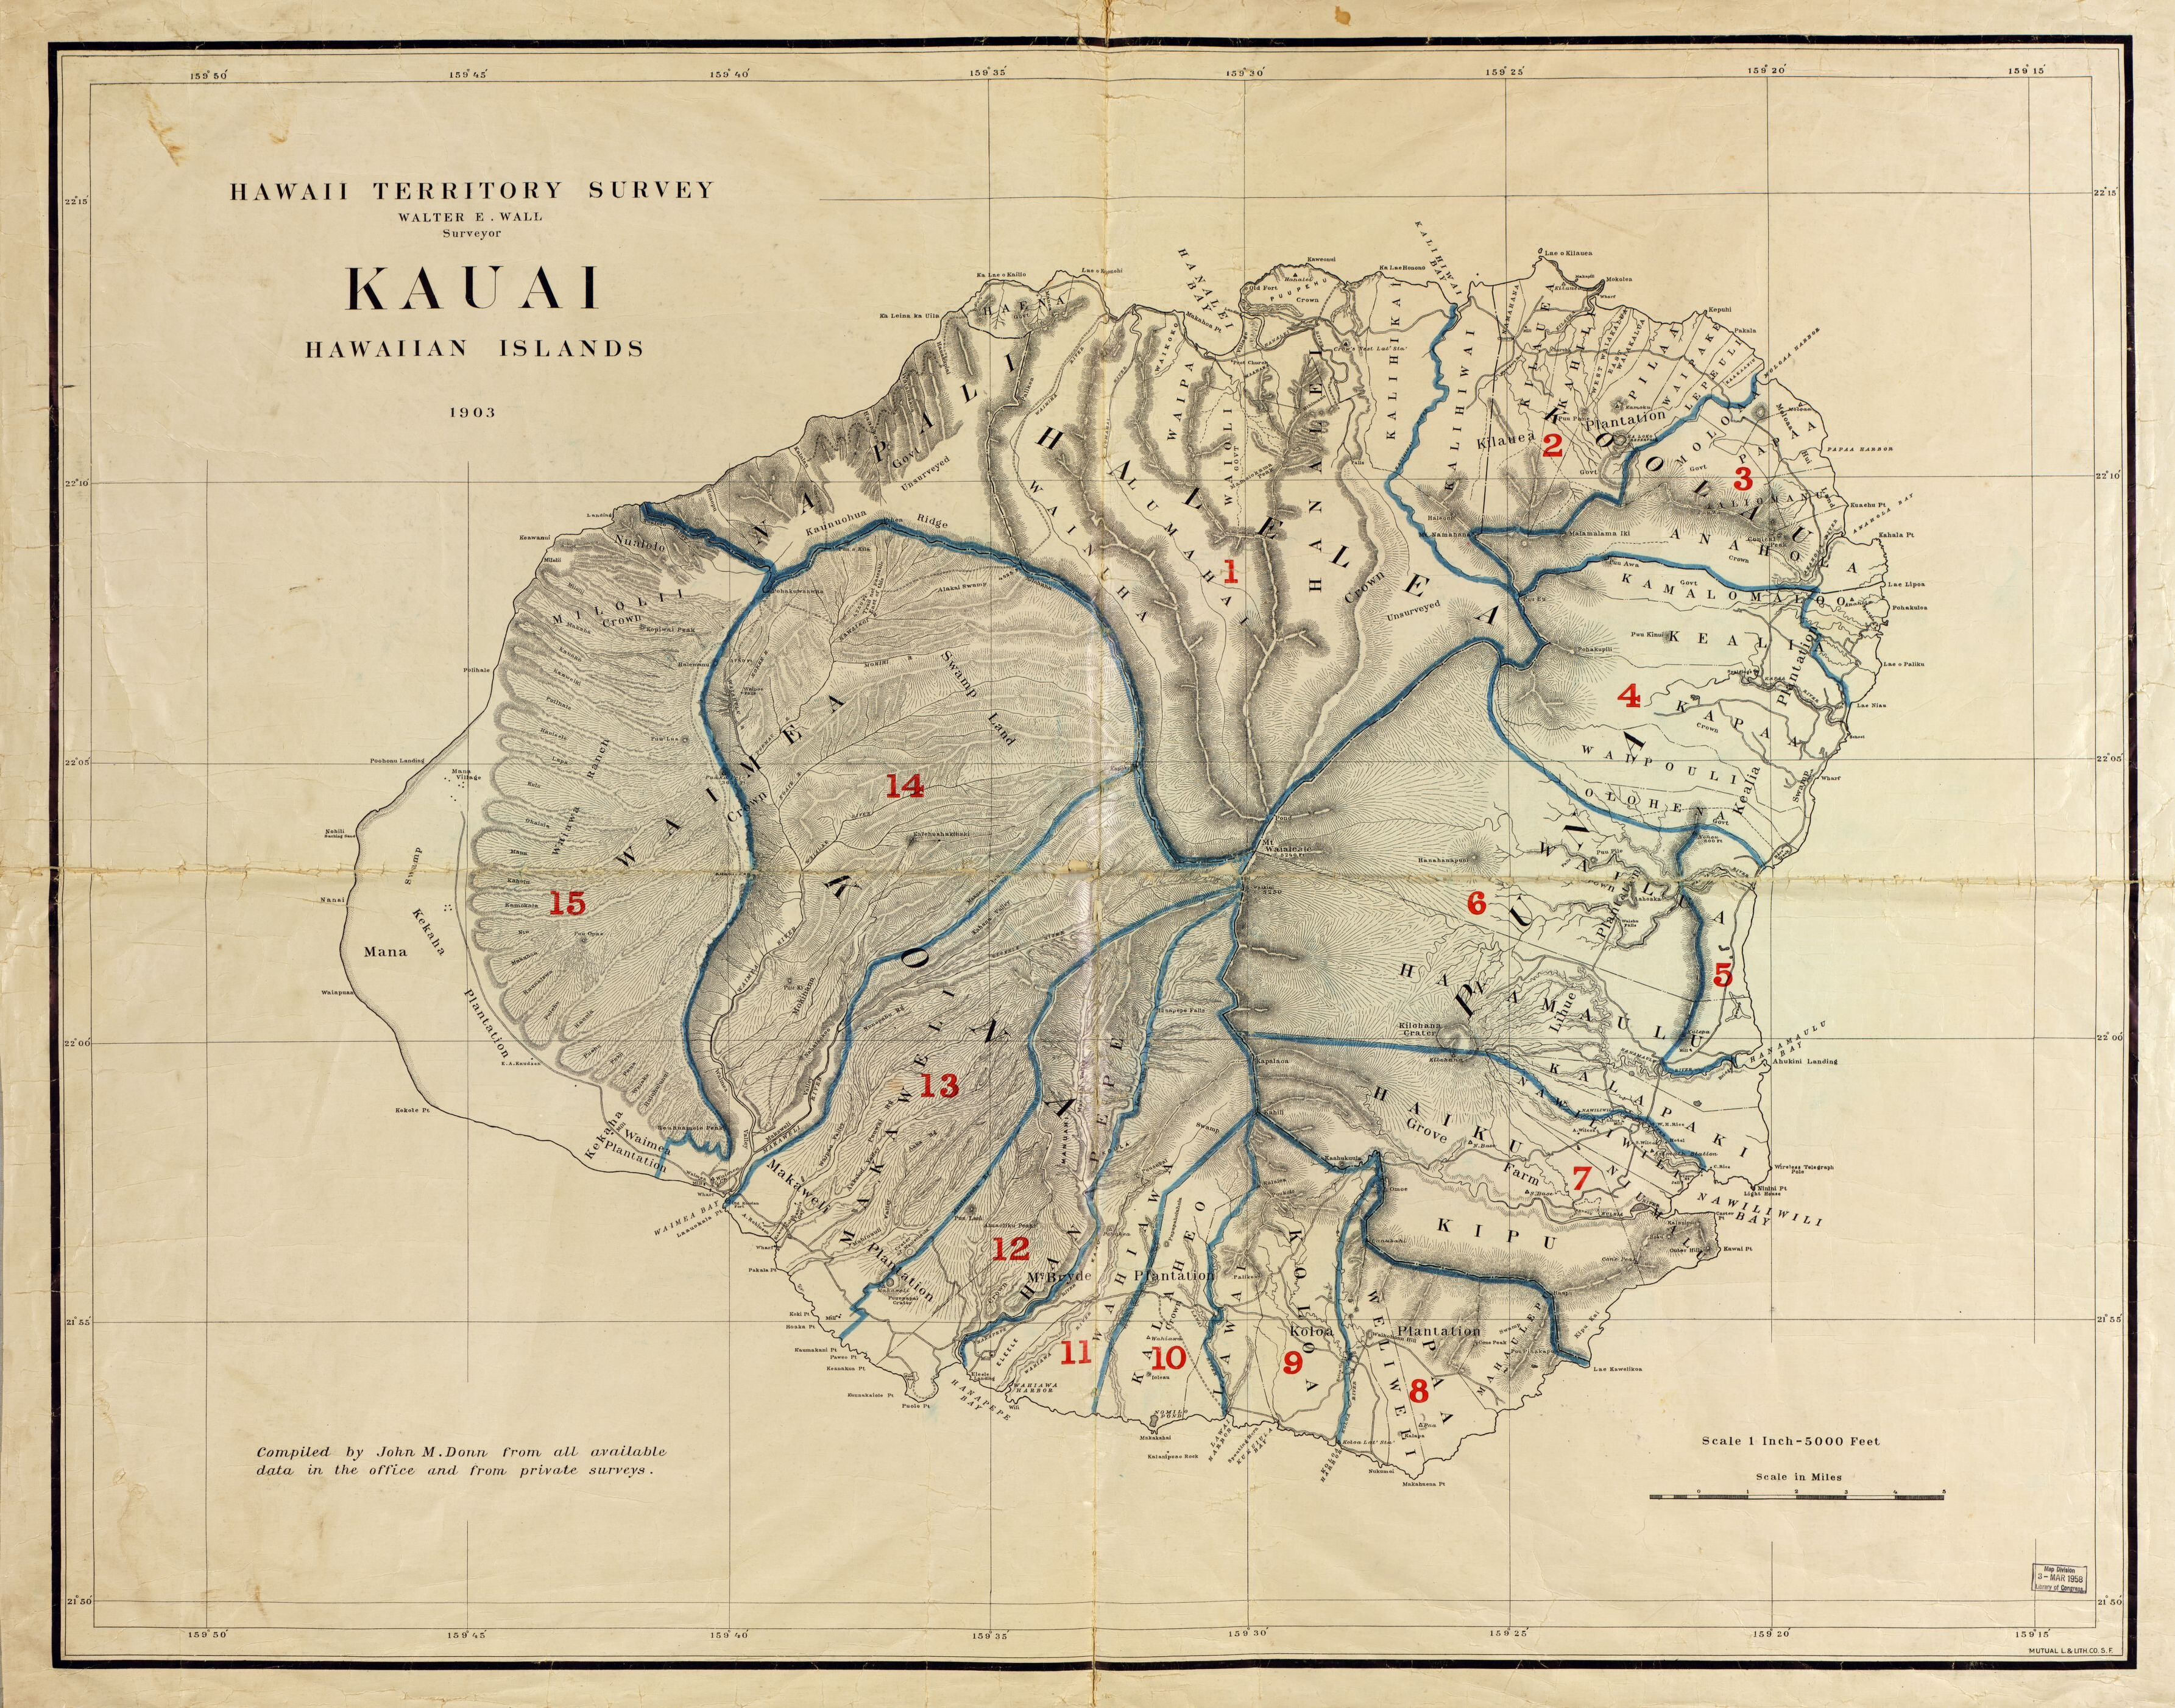 Kauai, Hawaiian Islands, 1903 / $C Walter E. Wall, Surveyor - Printable Map Of Kauai